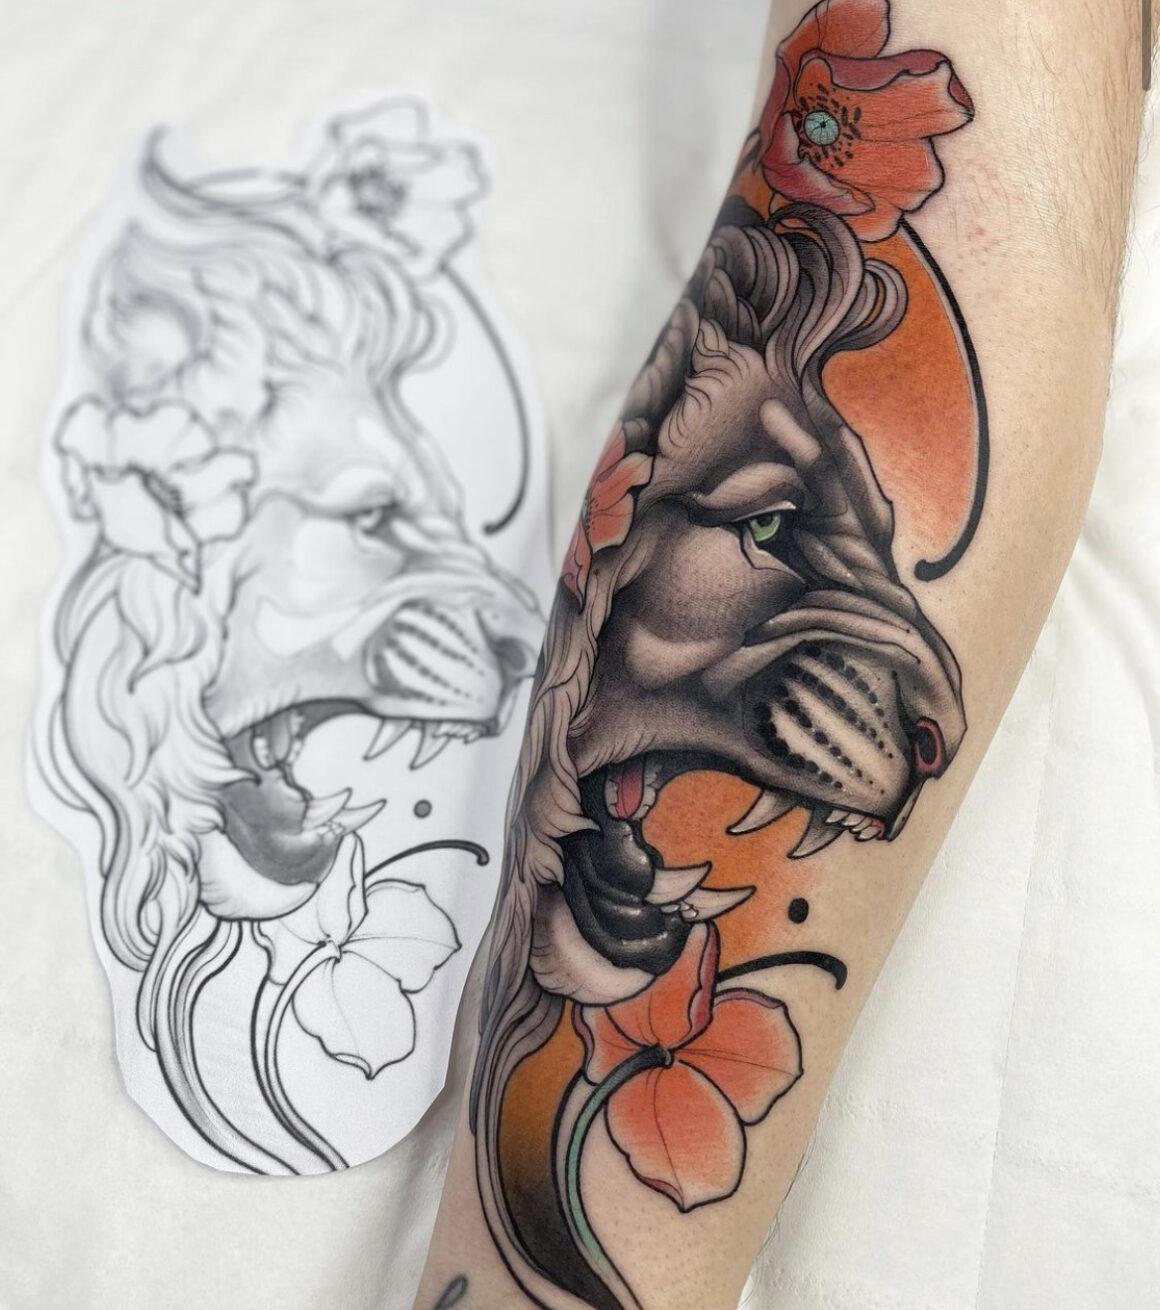 Lucas Ferraira, Bat Country Tattoo Club, Porto, Portugal